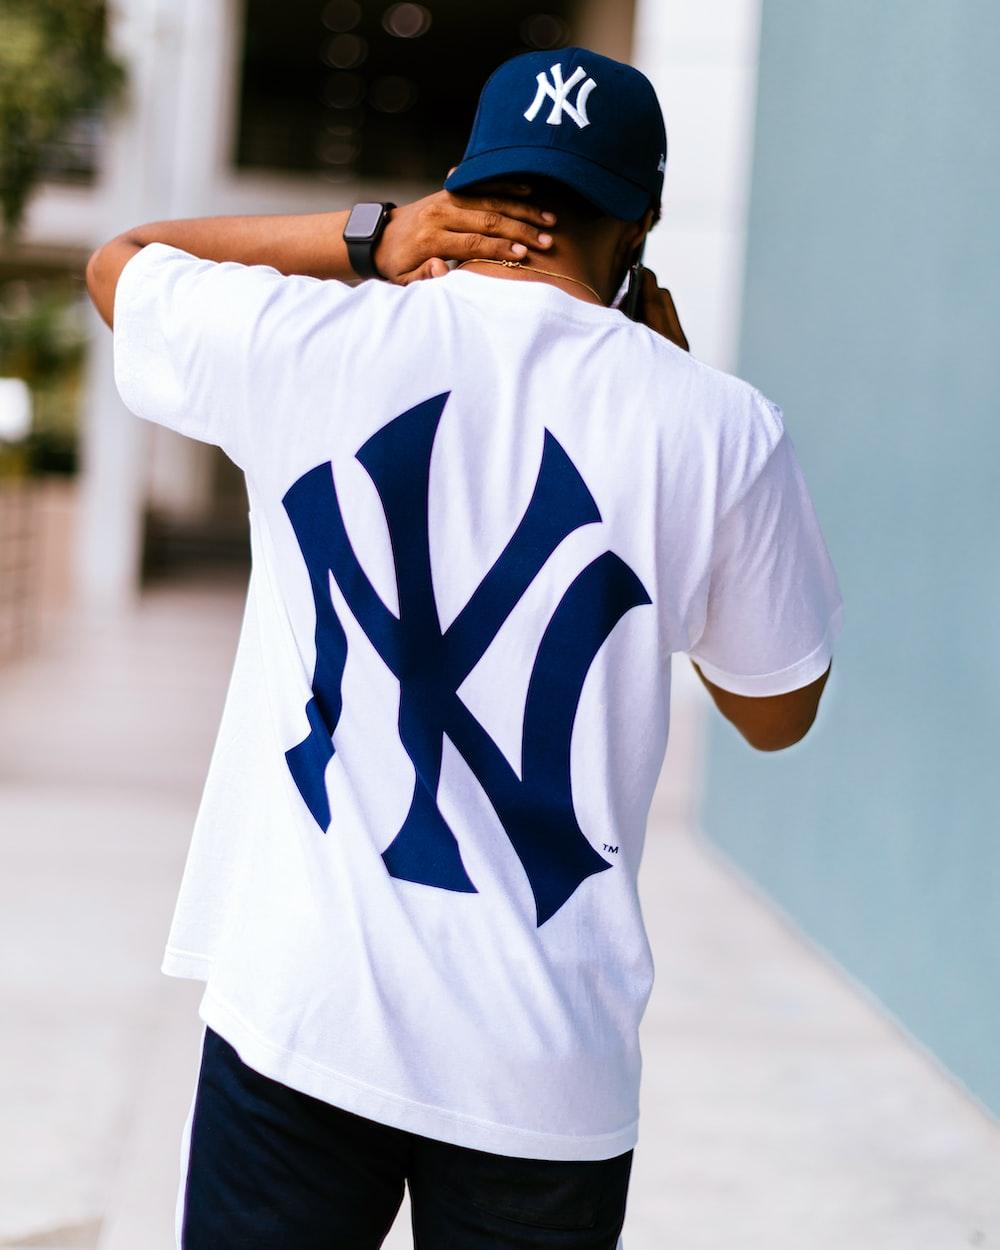 man wearing white and blue New York Yankees t-shirt walking while touching his neck